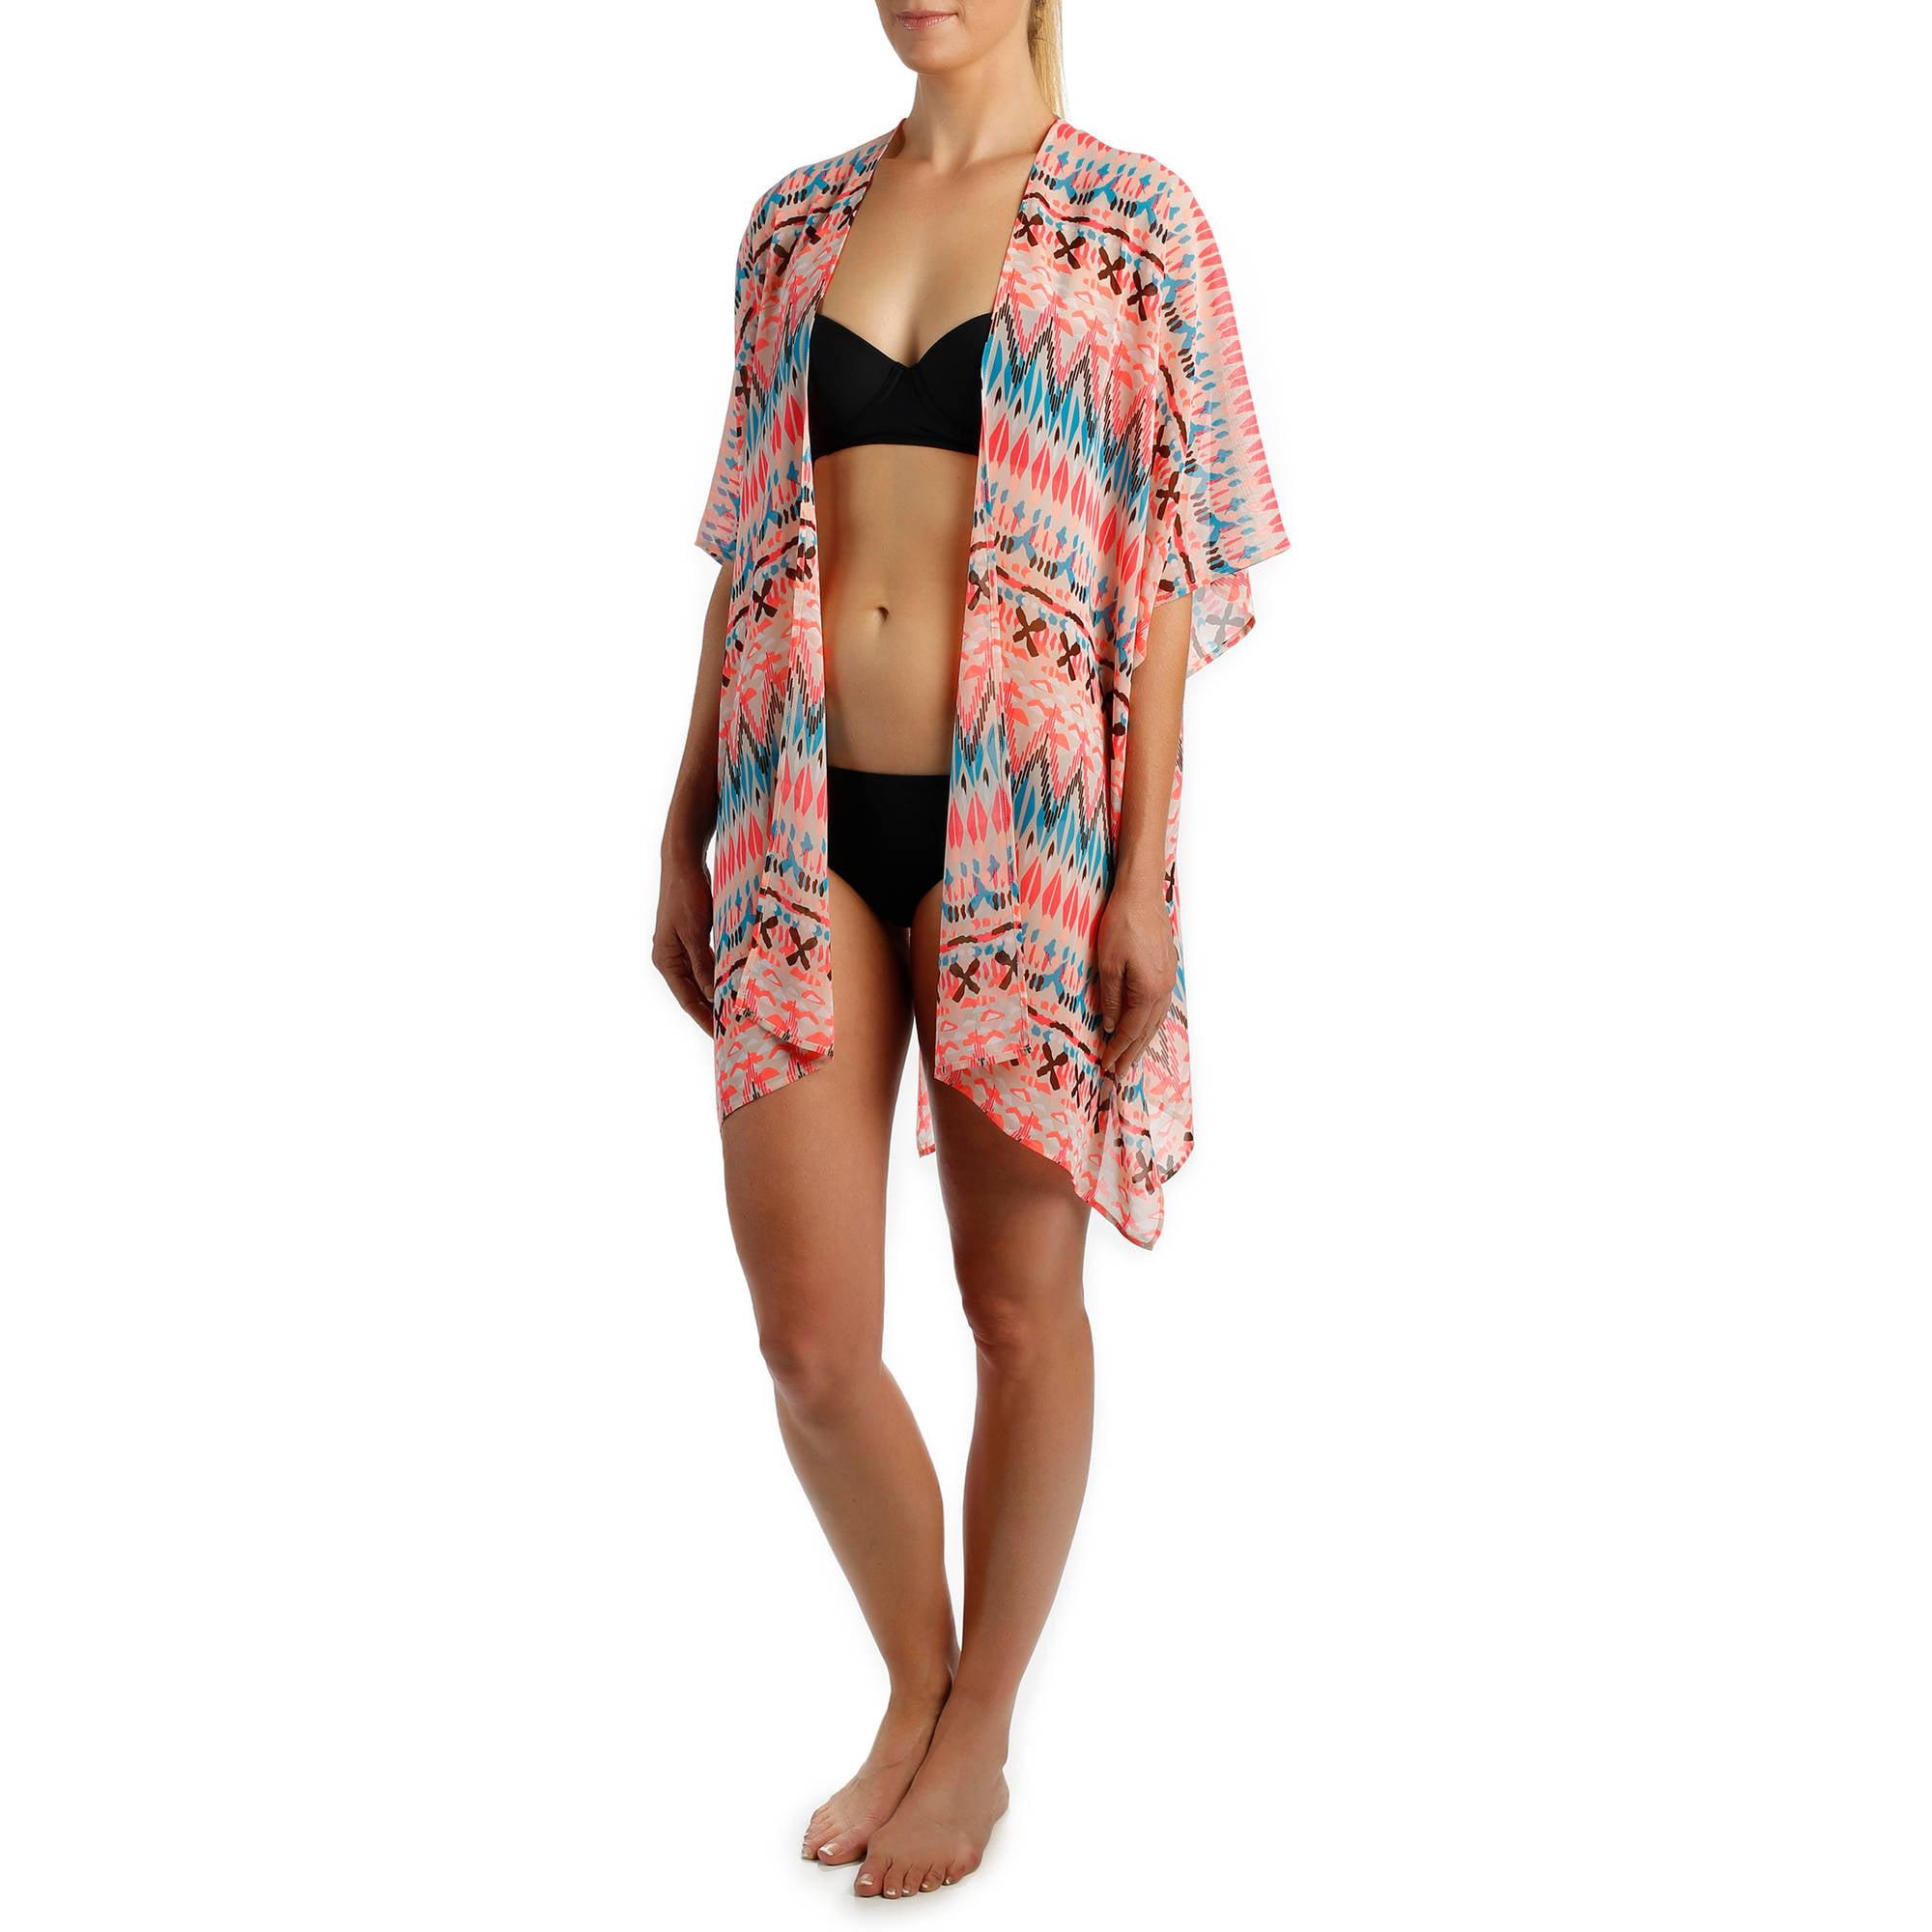 376f93ae482 In Gear - Women s Swim Tube Cover-Up Dress - Walmart.com